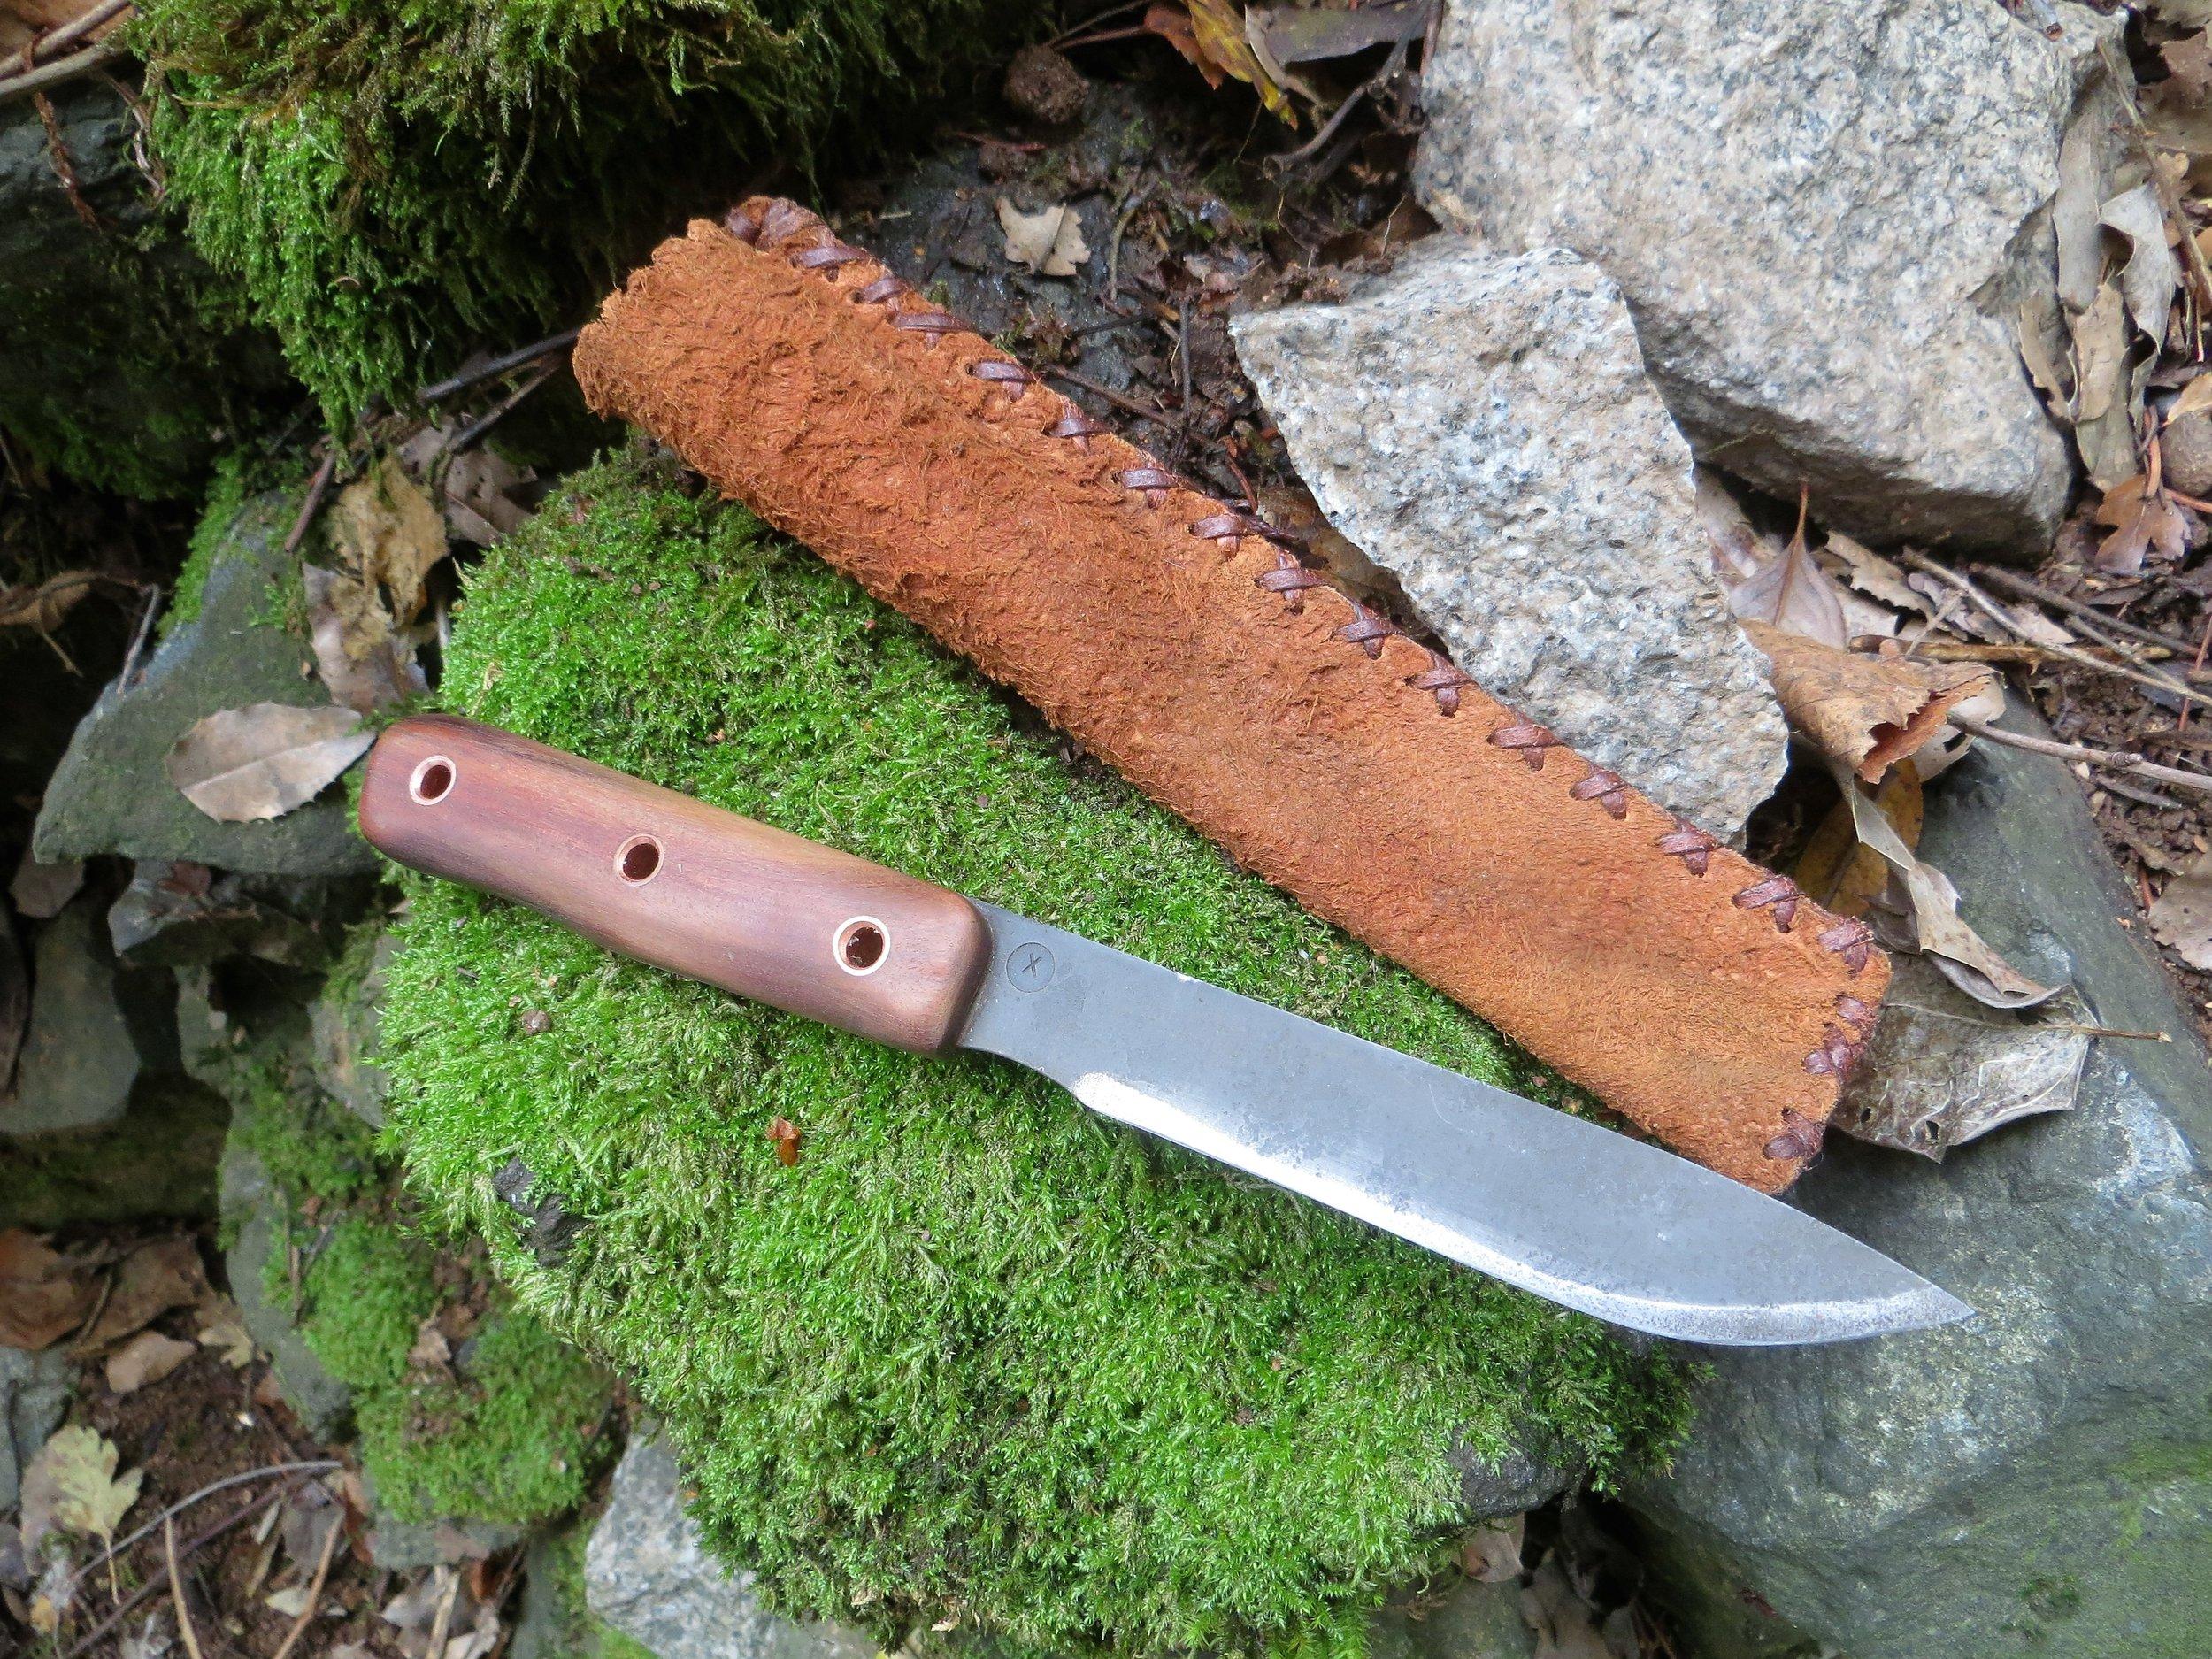 9 Finished Jungle knife and sheath.